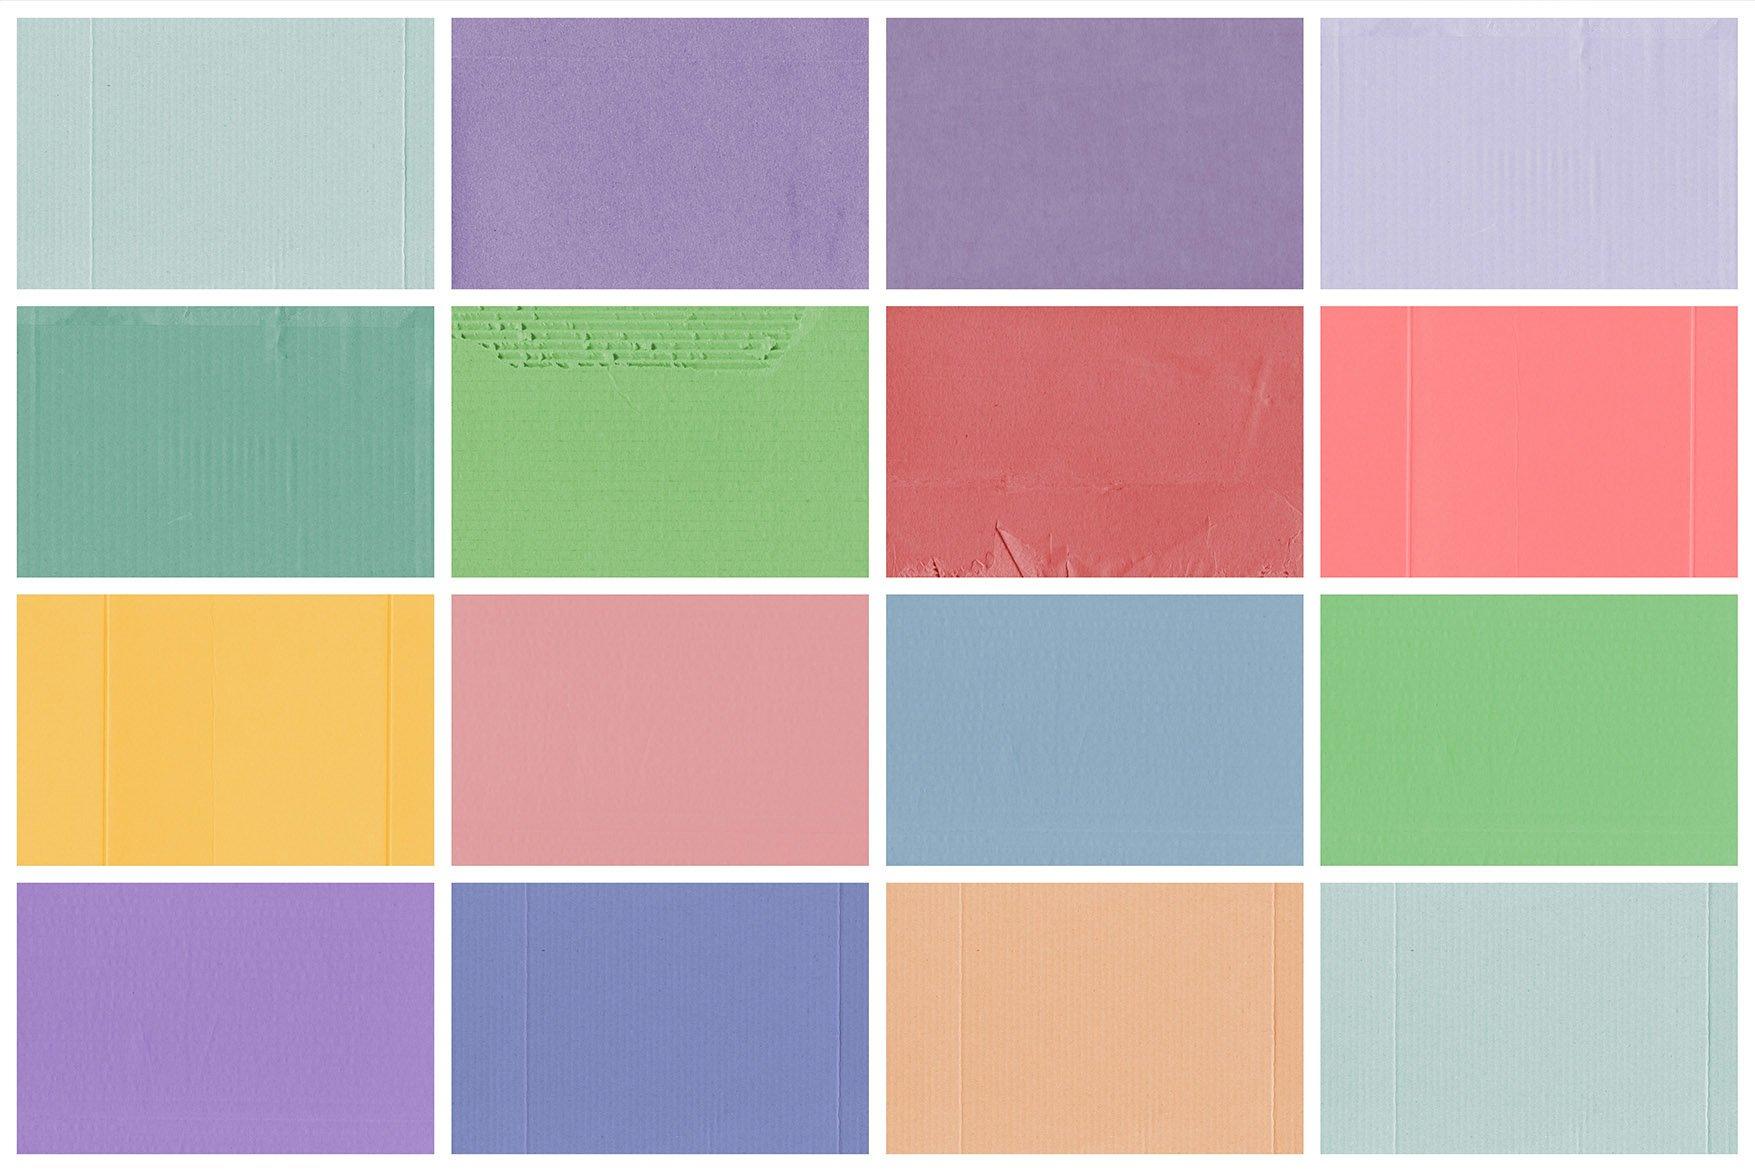 Pastel Cardboard Textures 2 example image 5